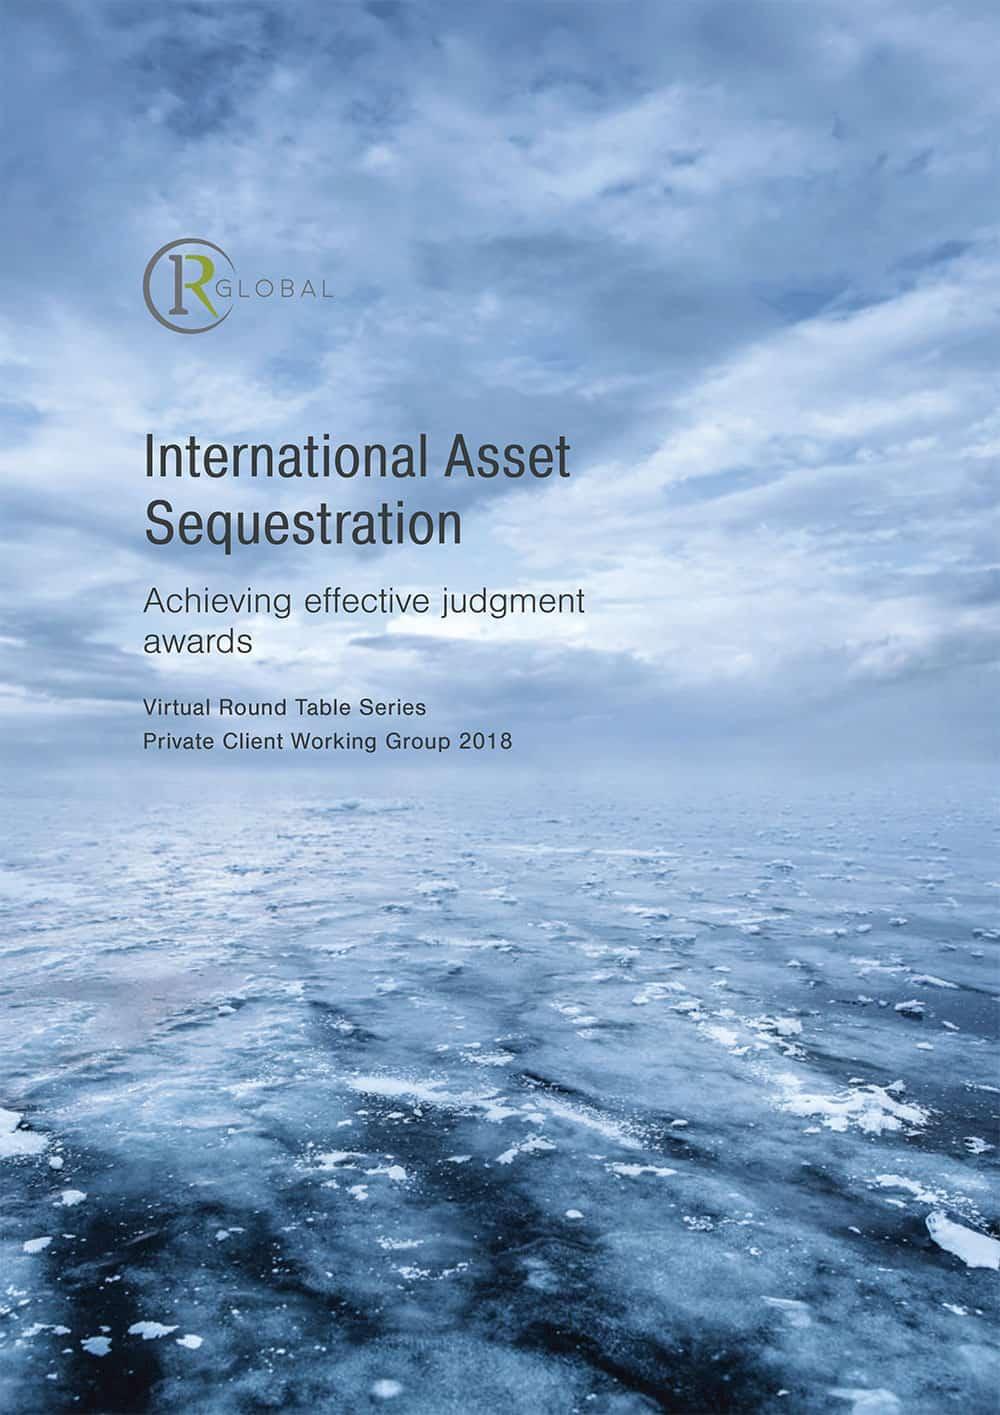 International Asset Sequestration Cover